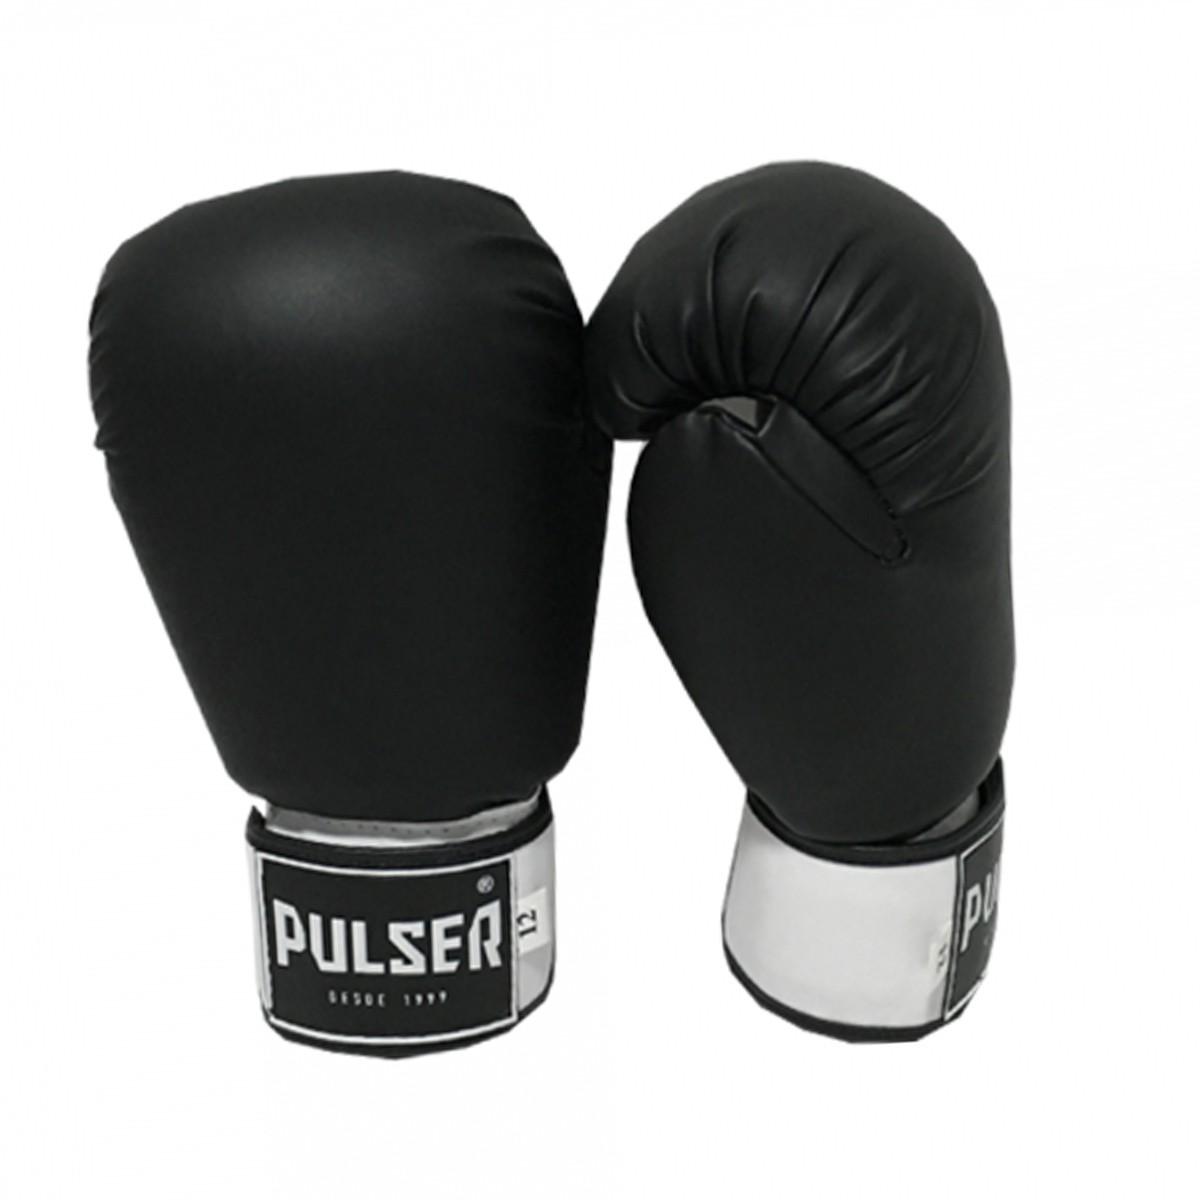 Luva de Boxe / Muay Thai 16oz - Preto - Pulser  - PRALUTA SHOP